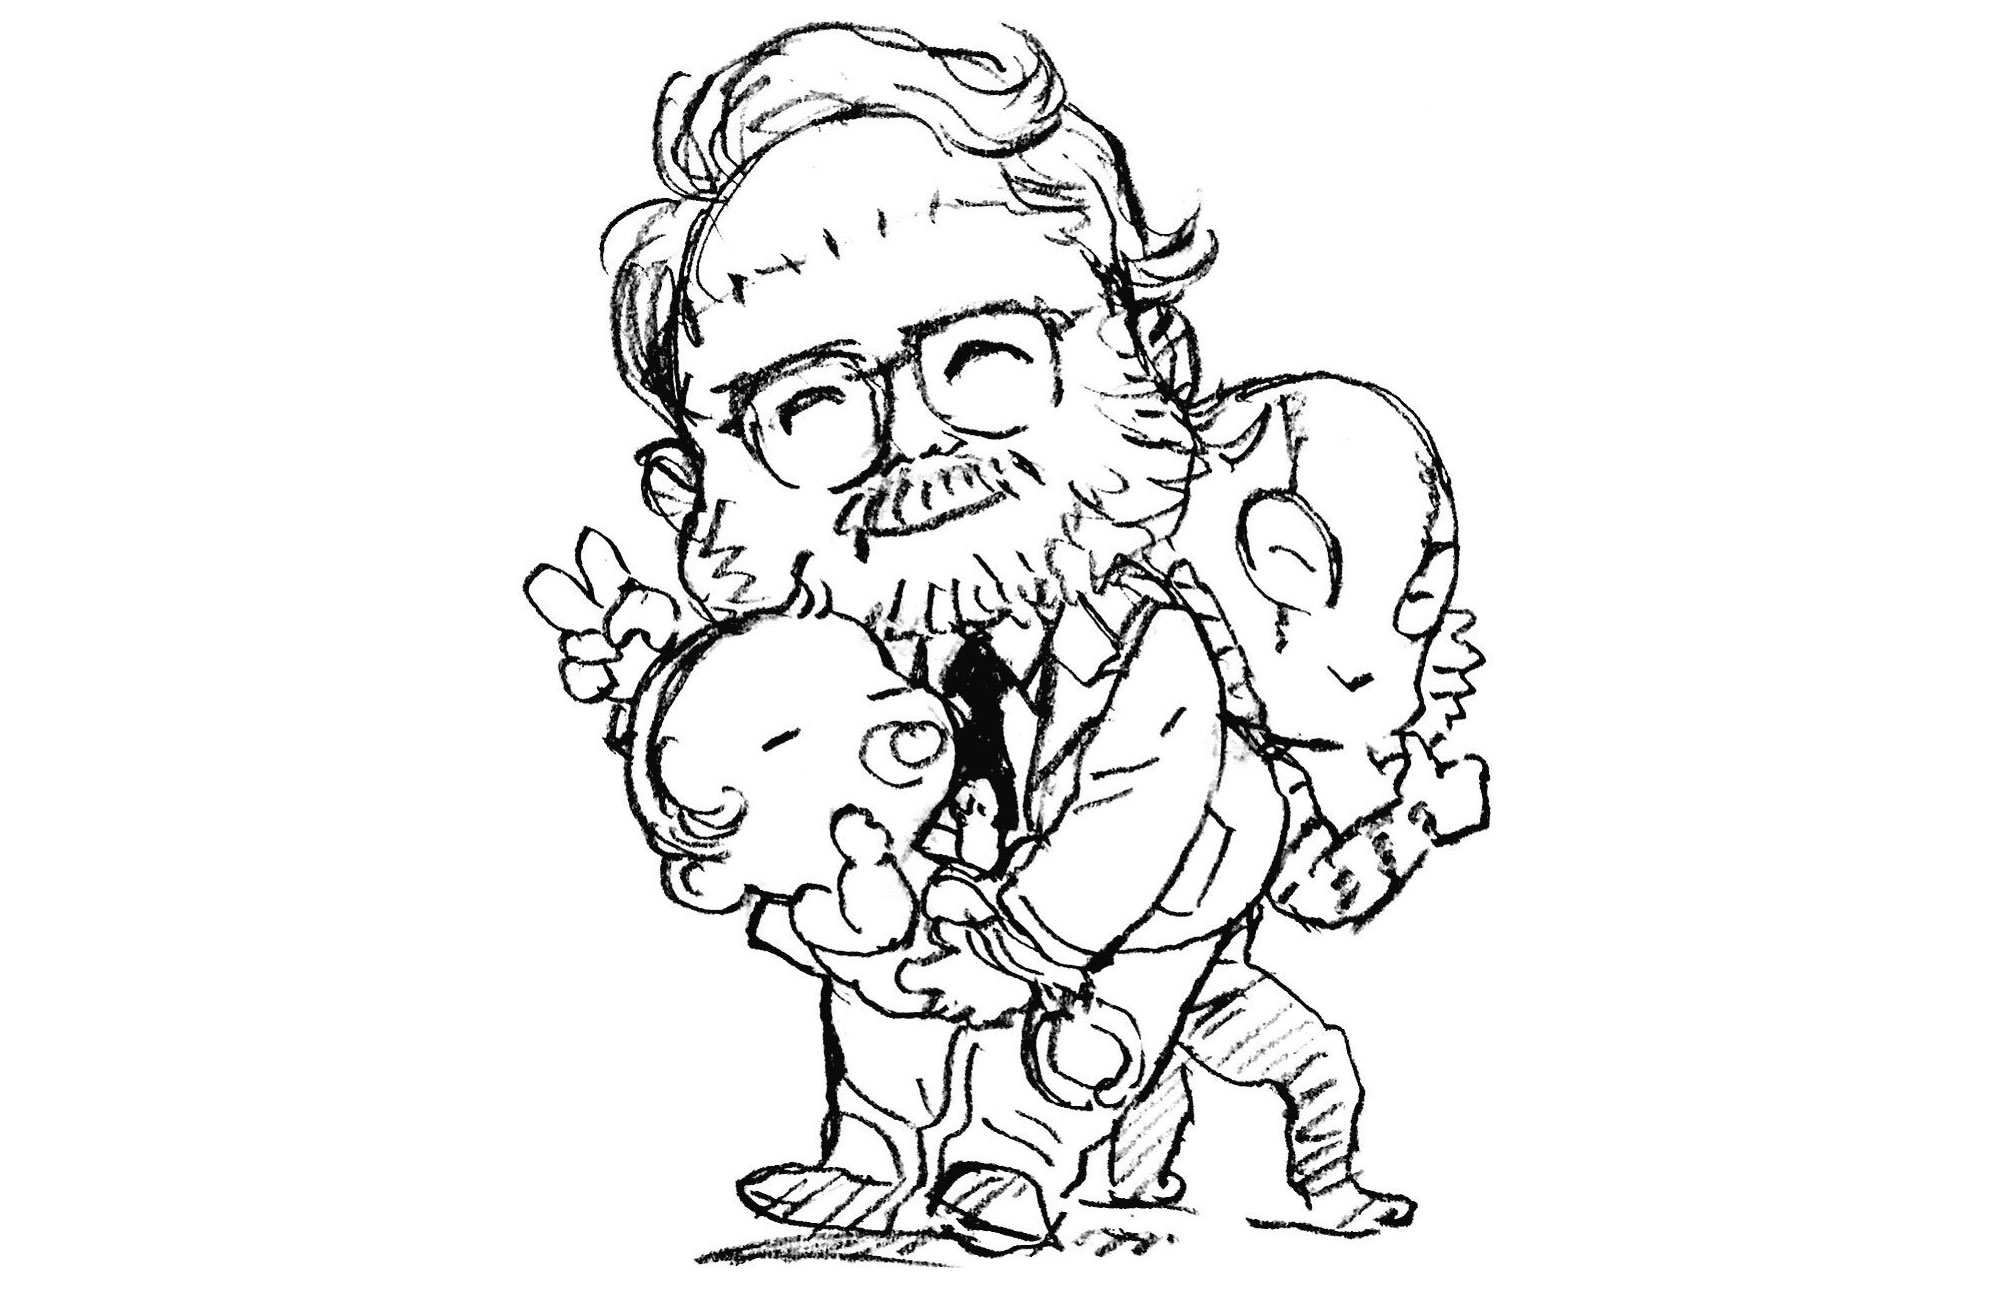 Guillermo del Toro dans Death Stranding, croqué par Yoji Shinkawa (2016)